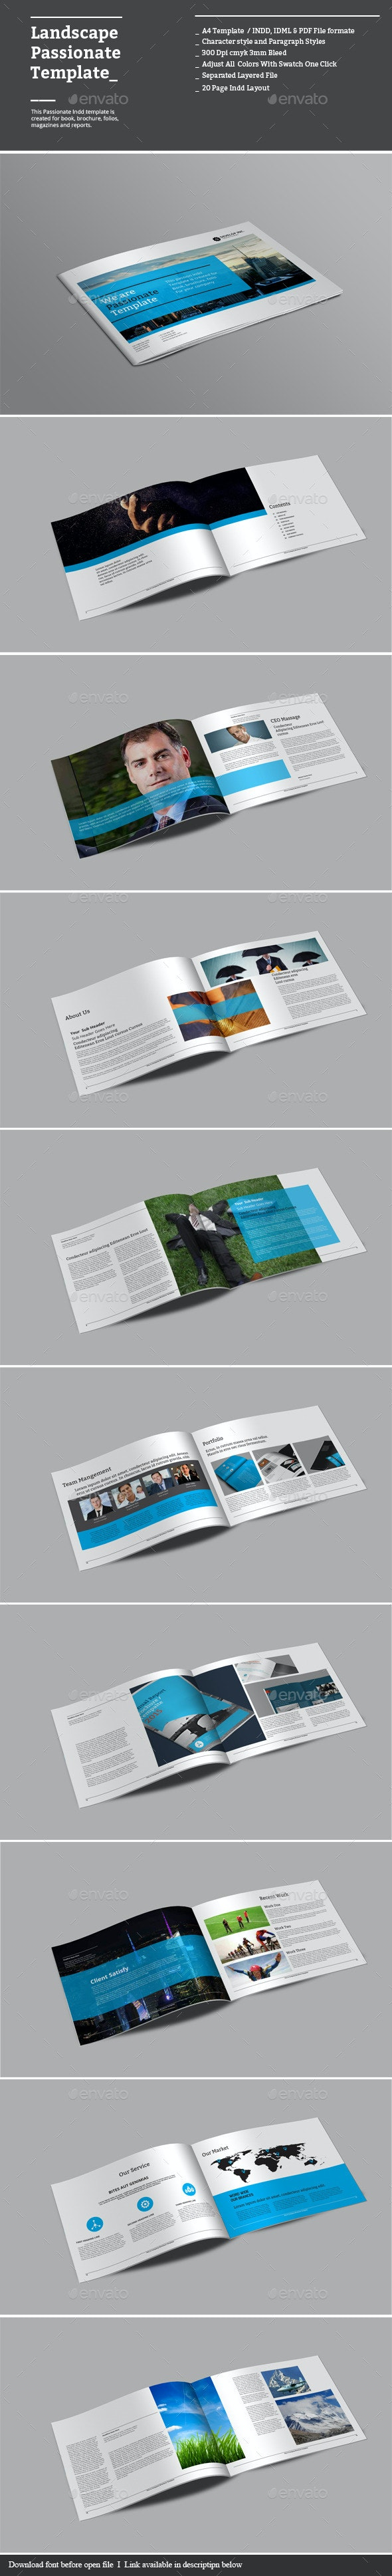 Landscape Passionate Templates - Corporate Brochures